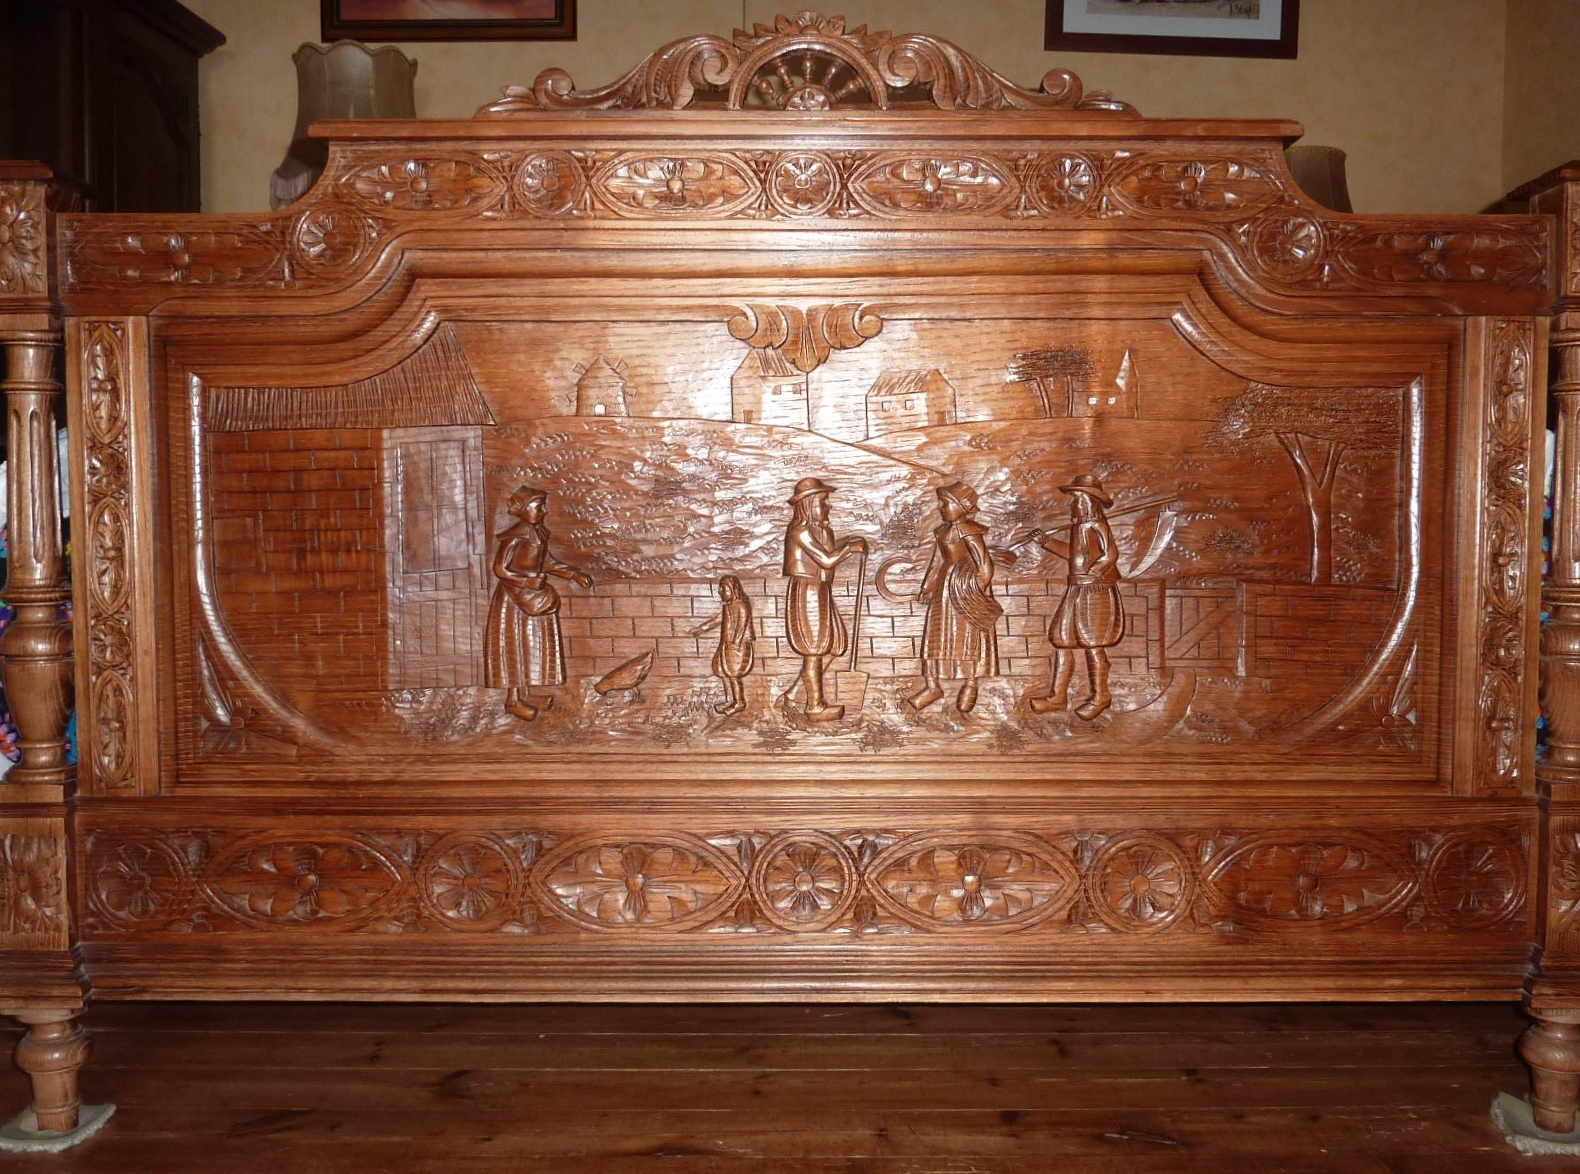 file t te de lit style breton jpg wikimedia commons. Black Bedroom Furniture Sets. Home Design Ideas